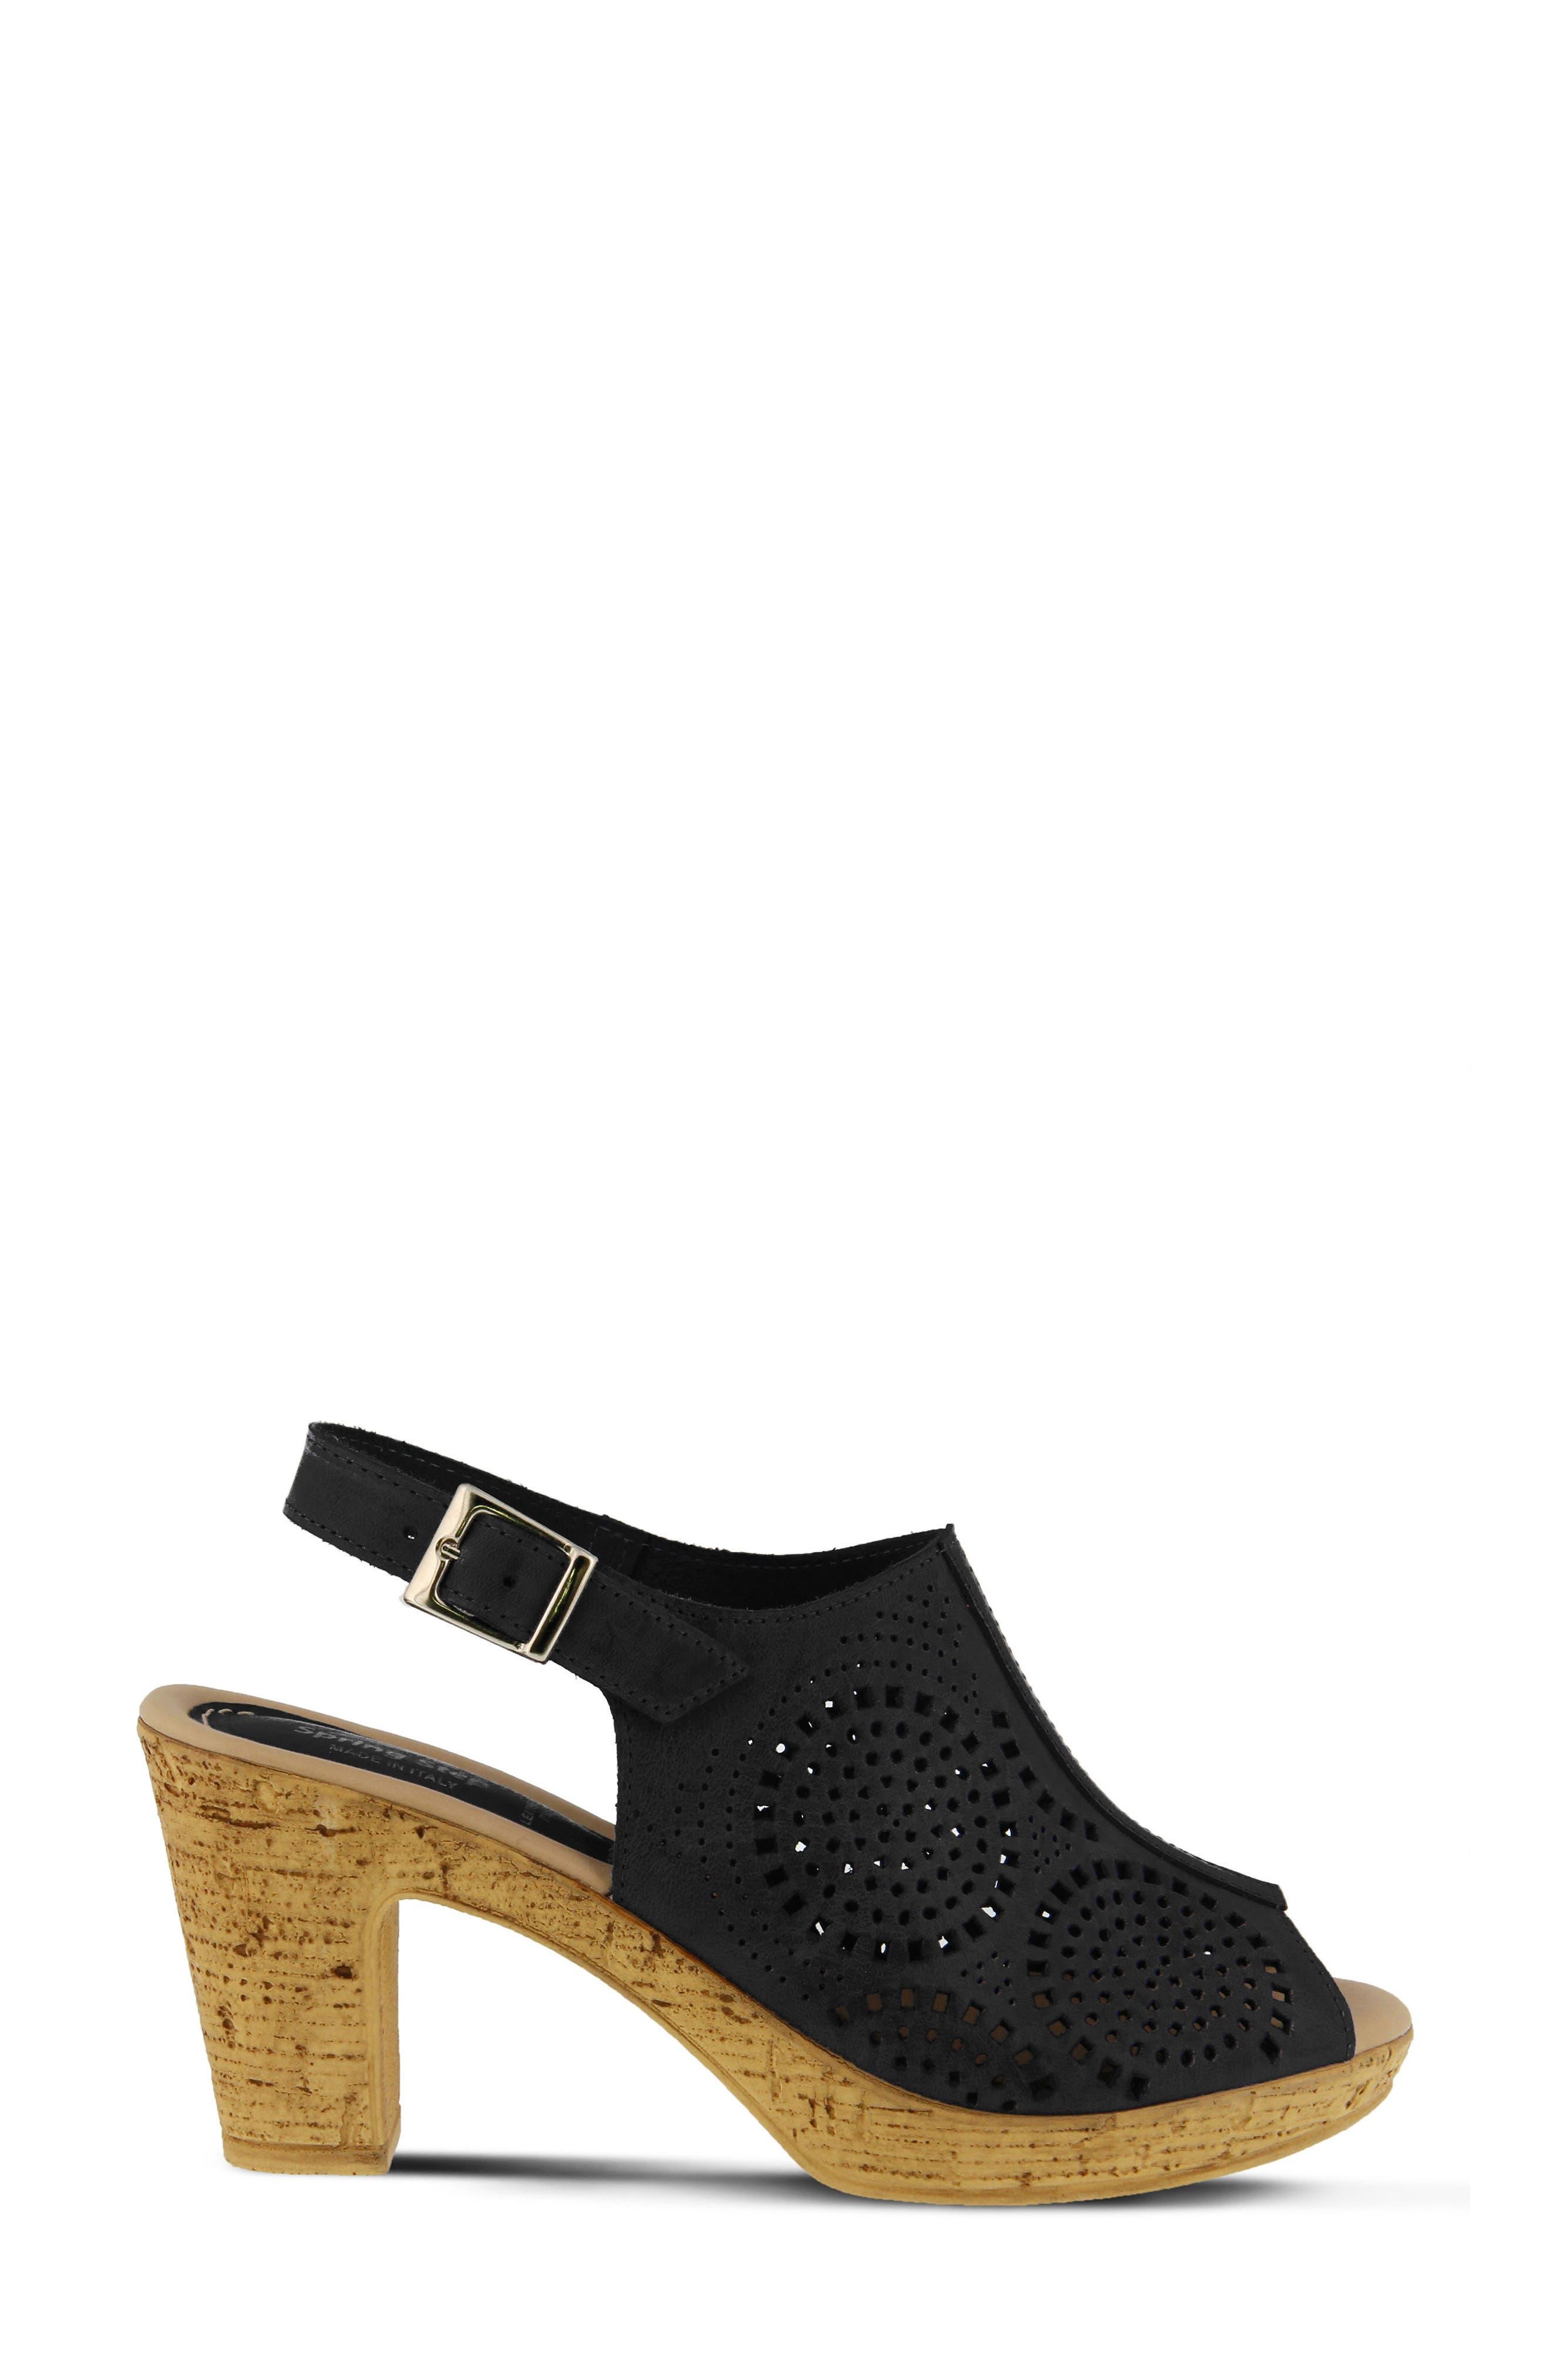 Liberty Platform Sandal,                             Alternate thumbnail 3, color,                             Black Leather